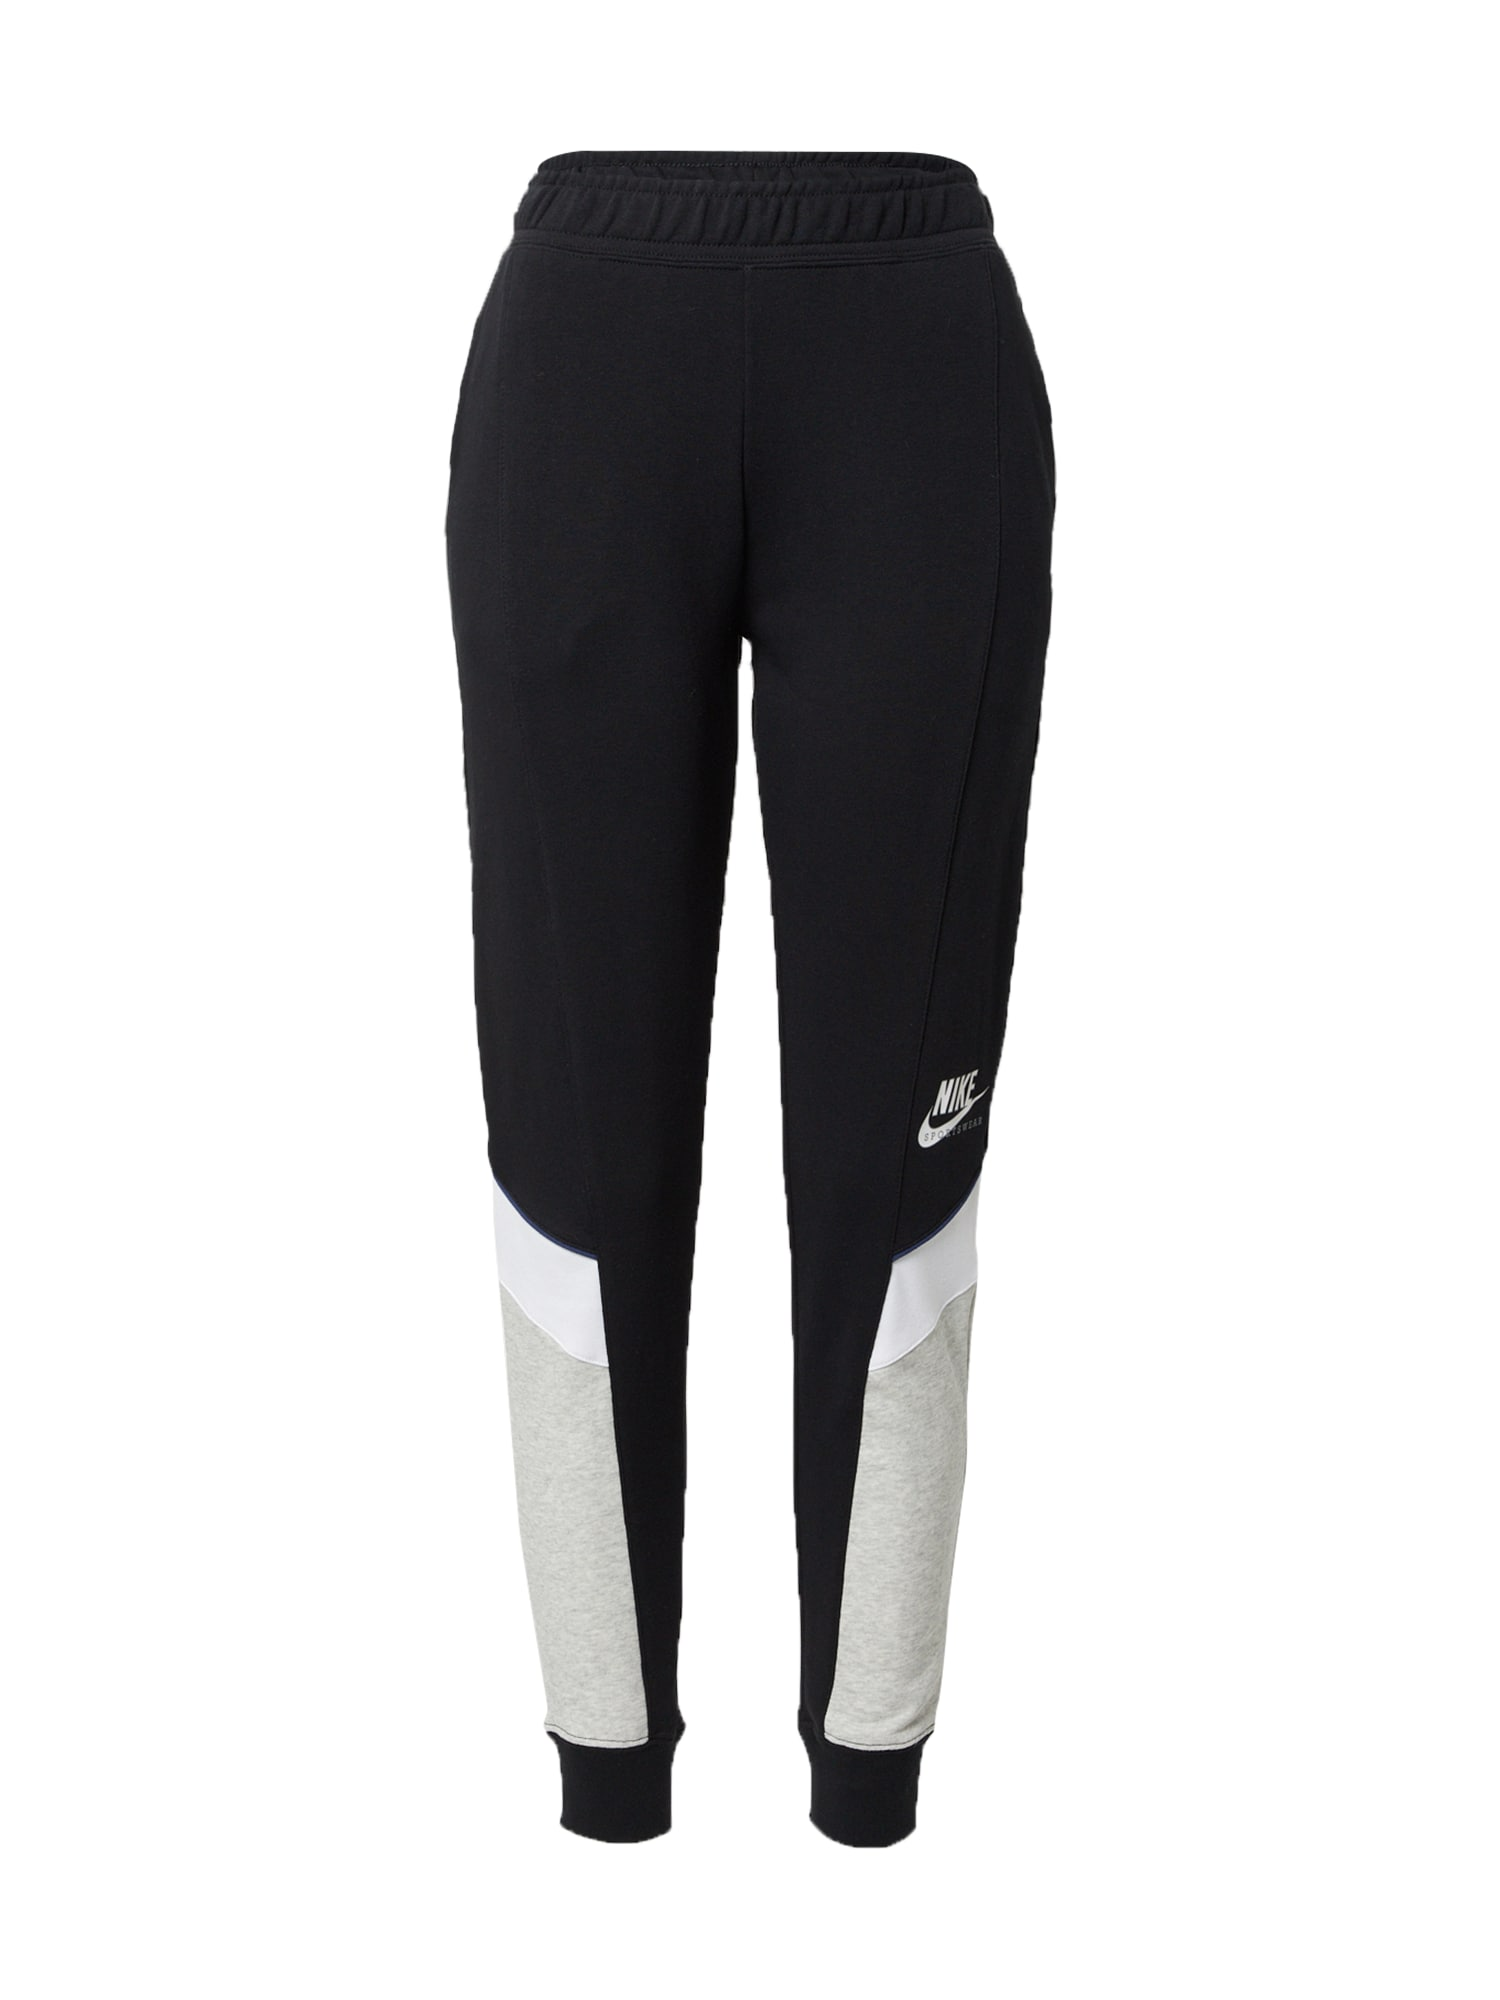 Nike Sportswear Kelnės juoda / balta / margai pilka